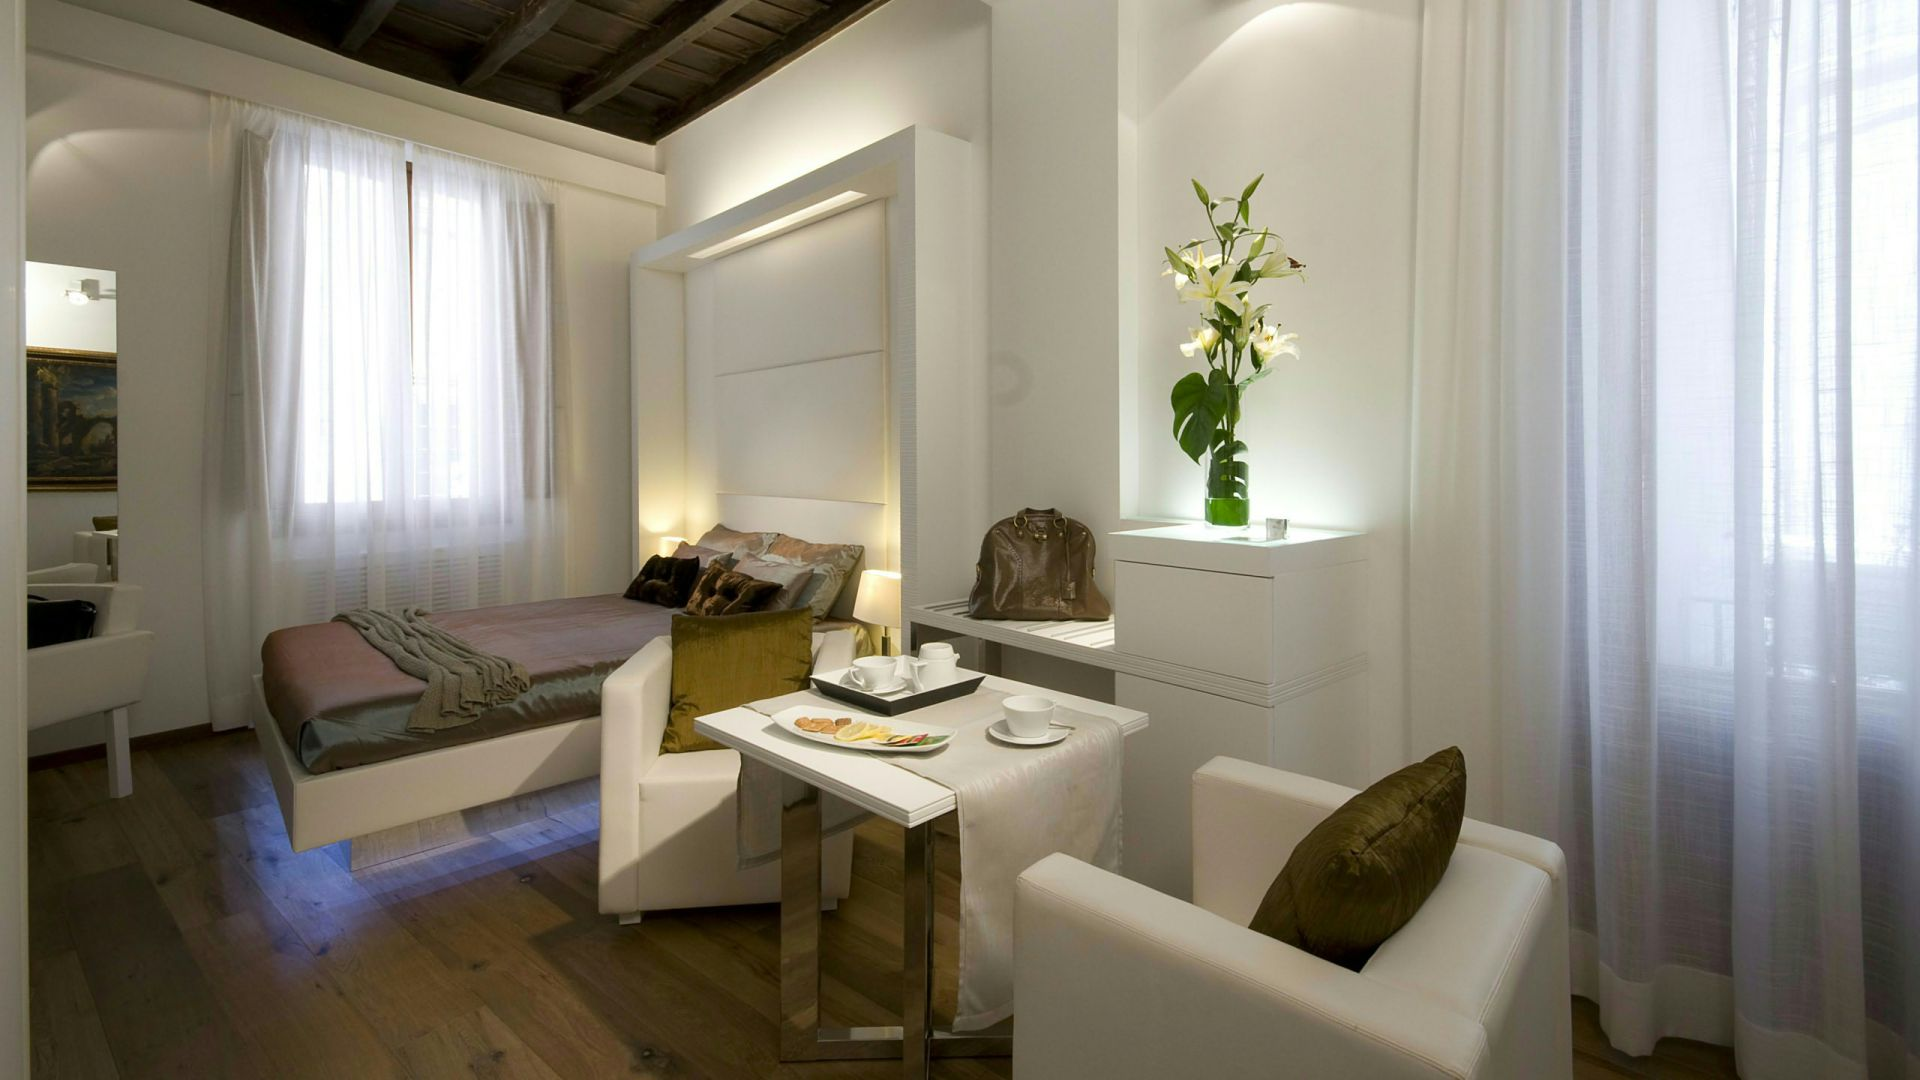 gigli-d-oro-suite-roma-suite-classic-3